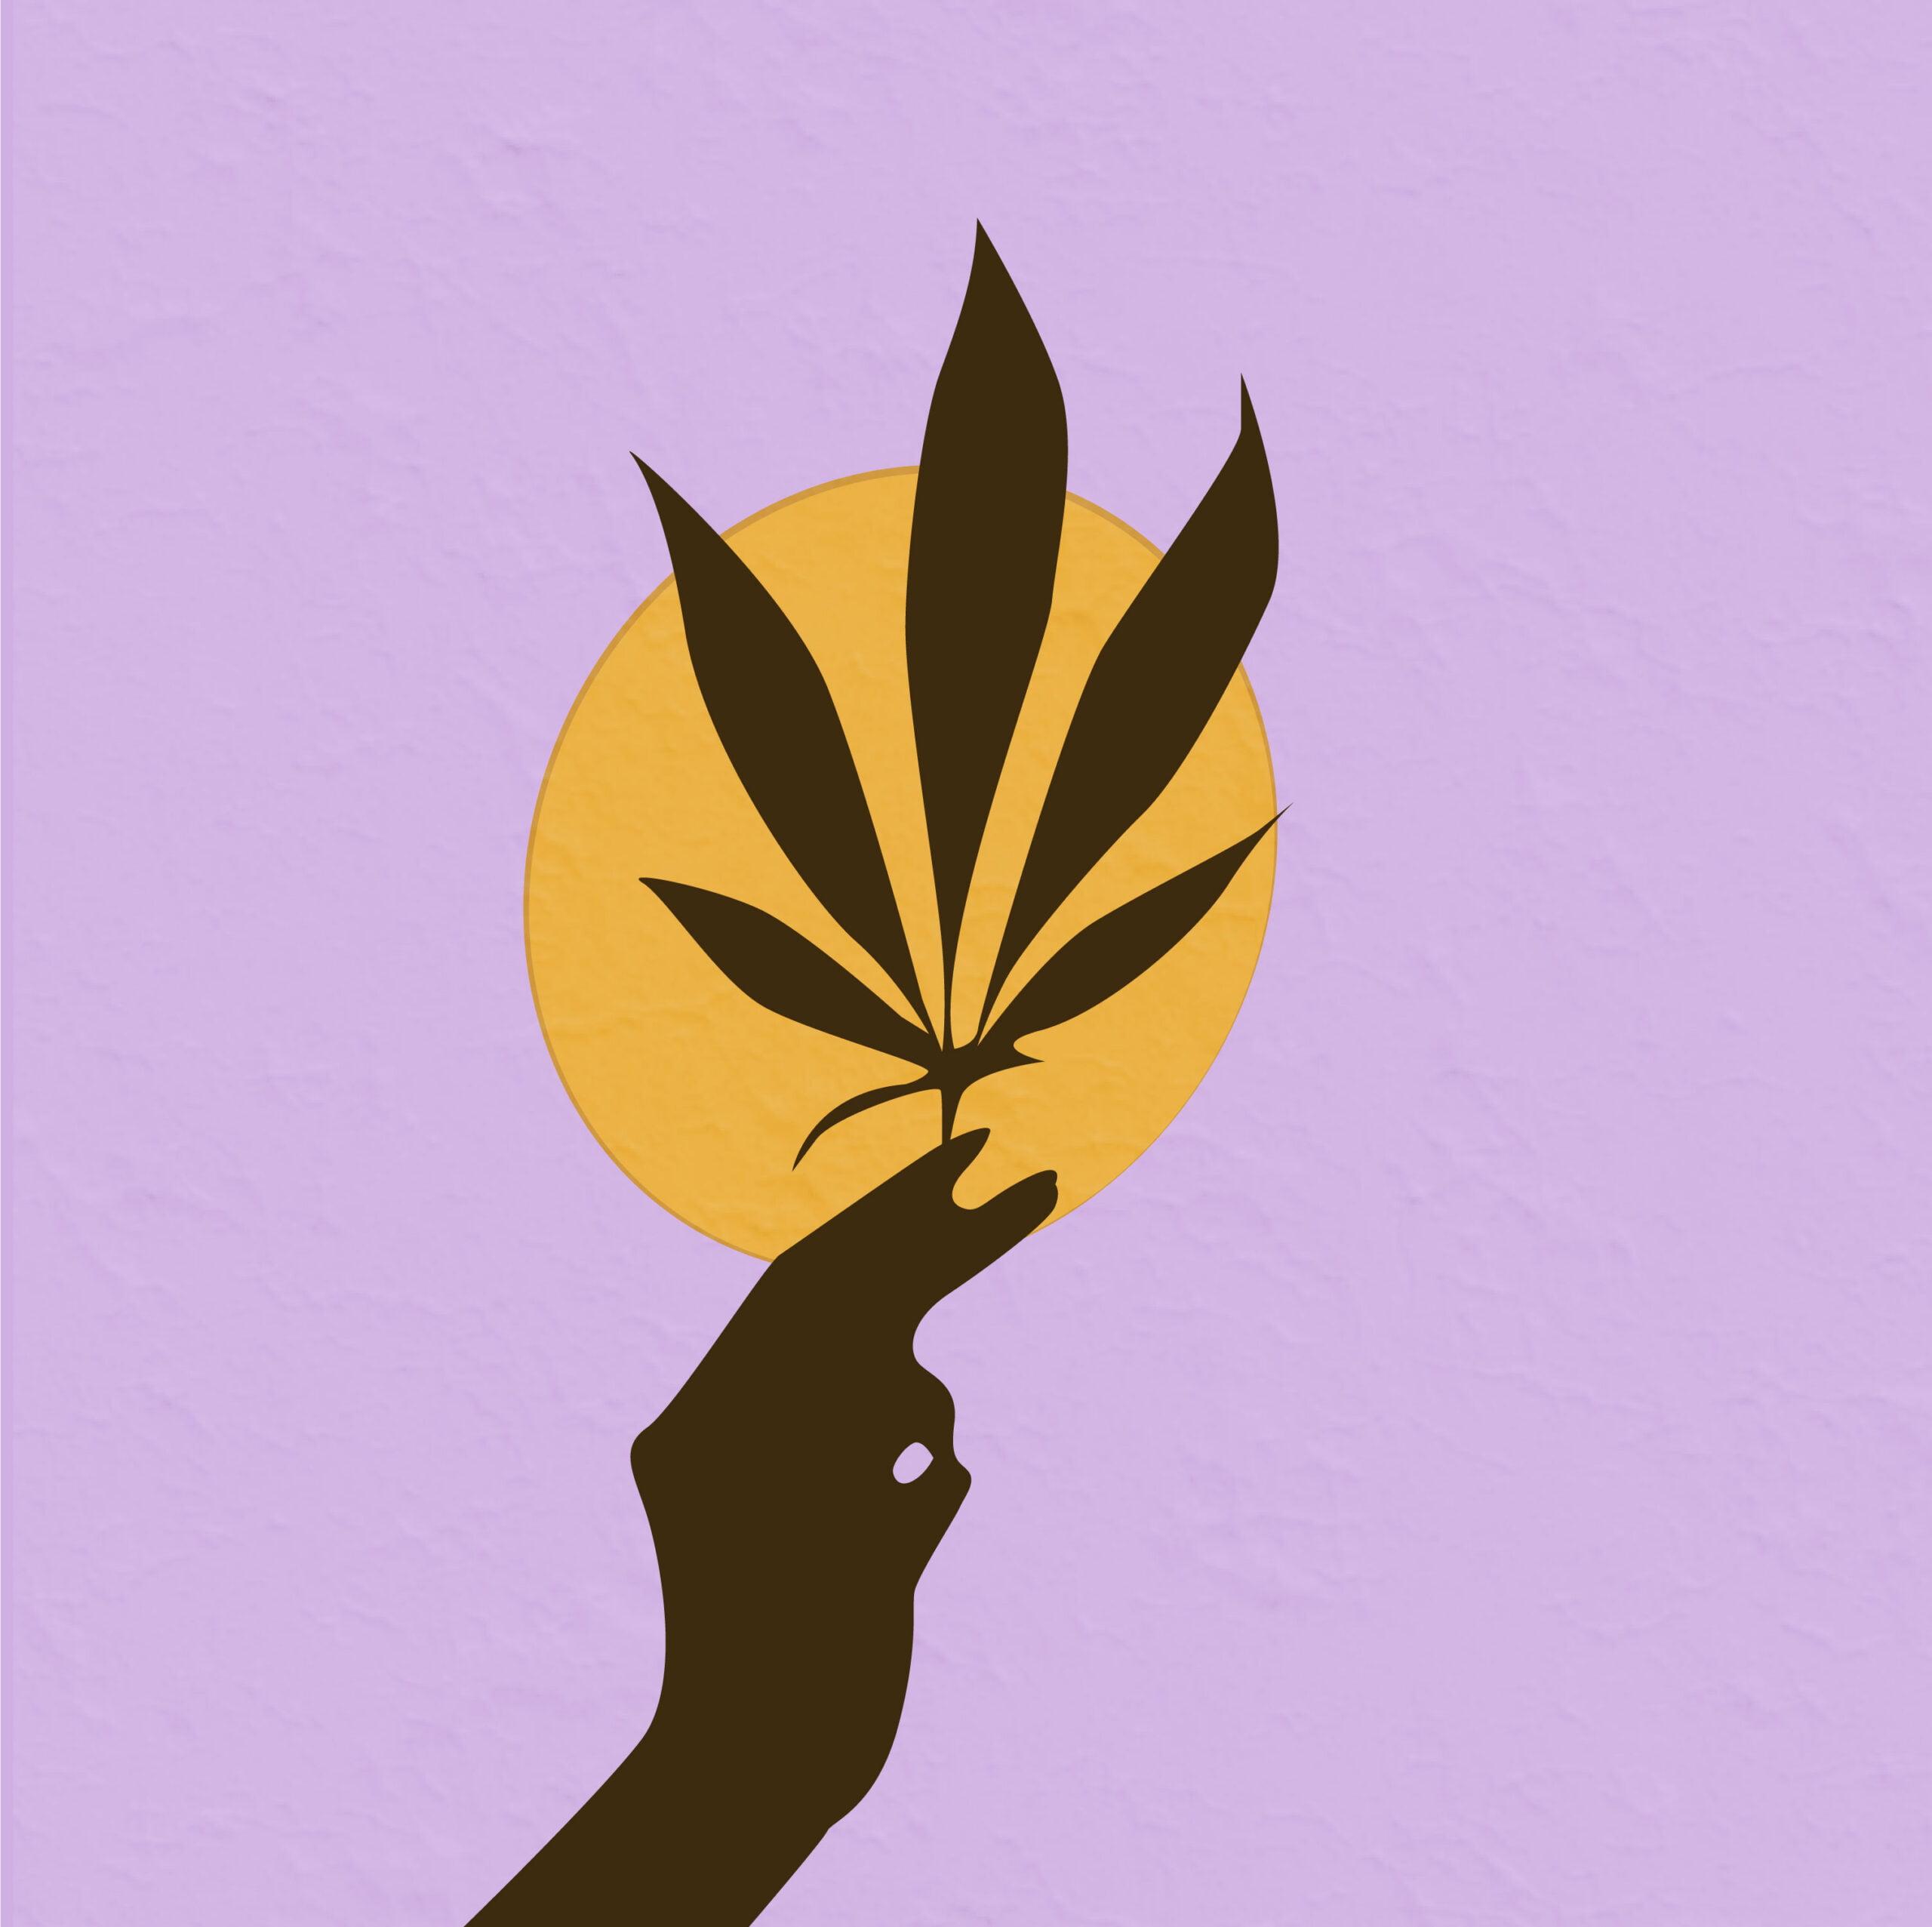 Cannabis illustration by Rita Azar for 360 Magazine